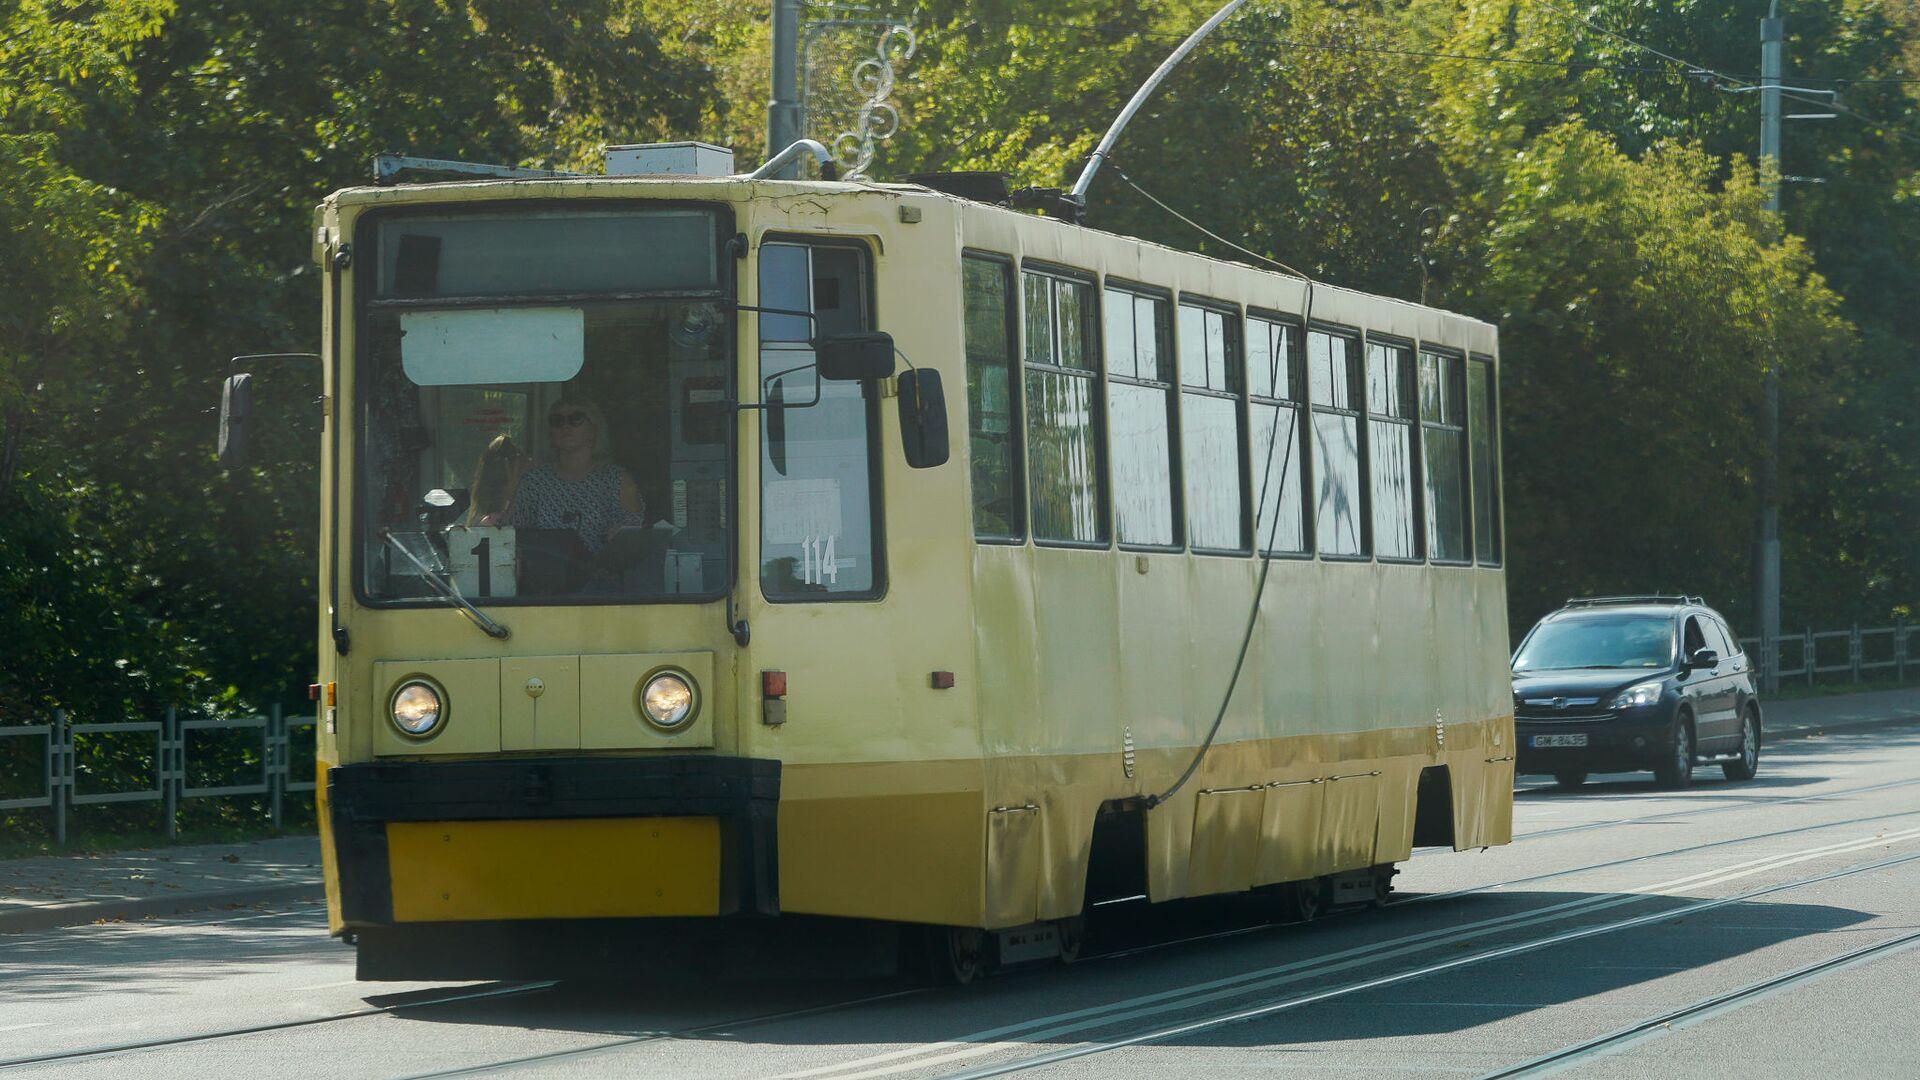 Старый трамвай в Даугавпилсе - Sputnik Латвия, 1920, 04.09.2021